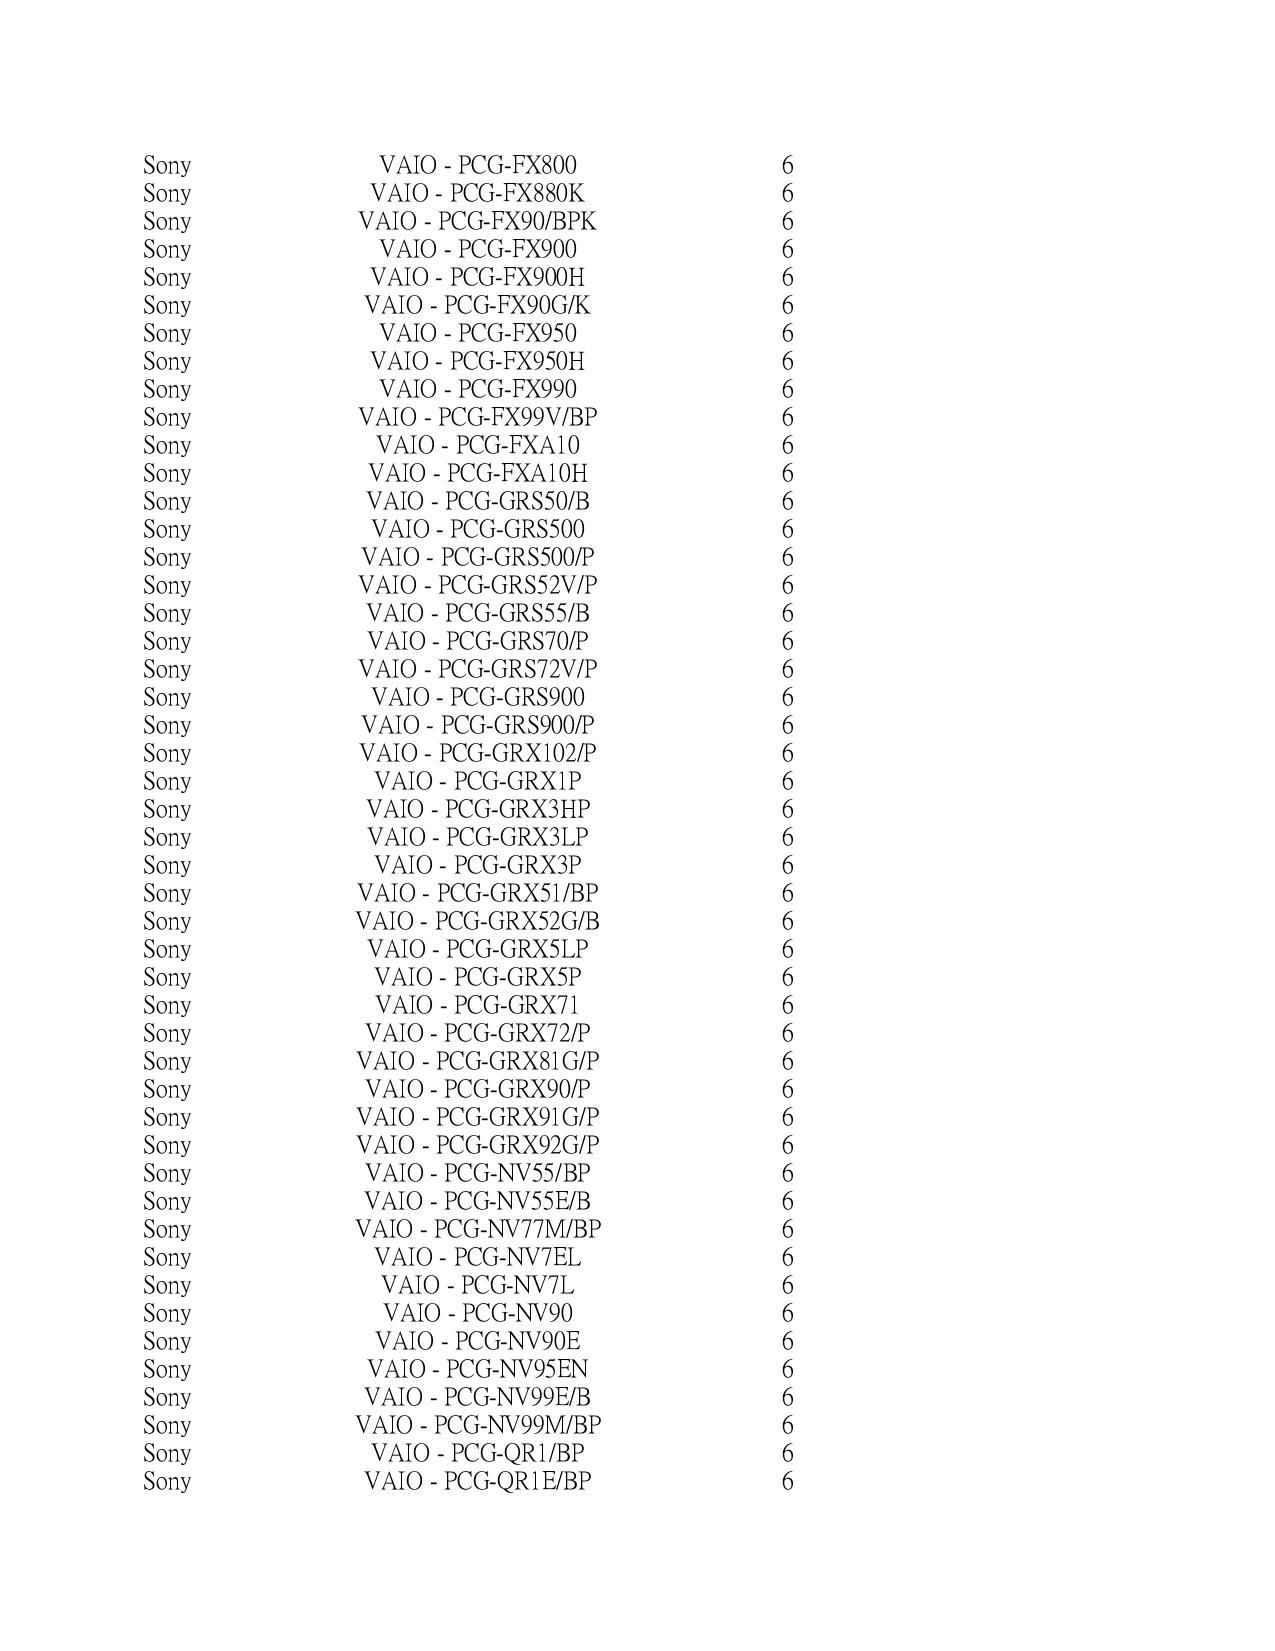 PDF manual for Sony Laptop VAIO PCG-GRX520